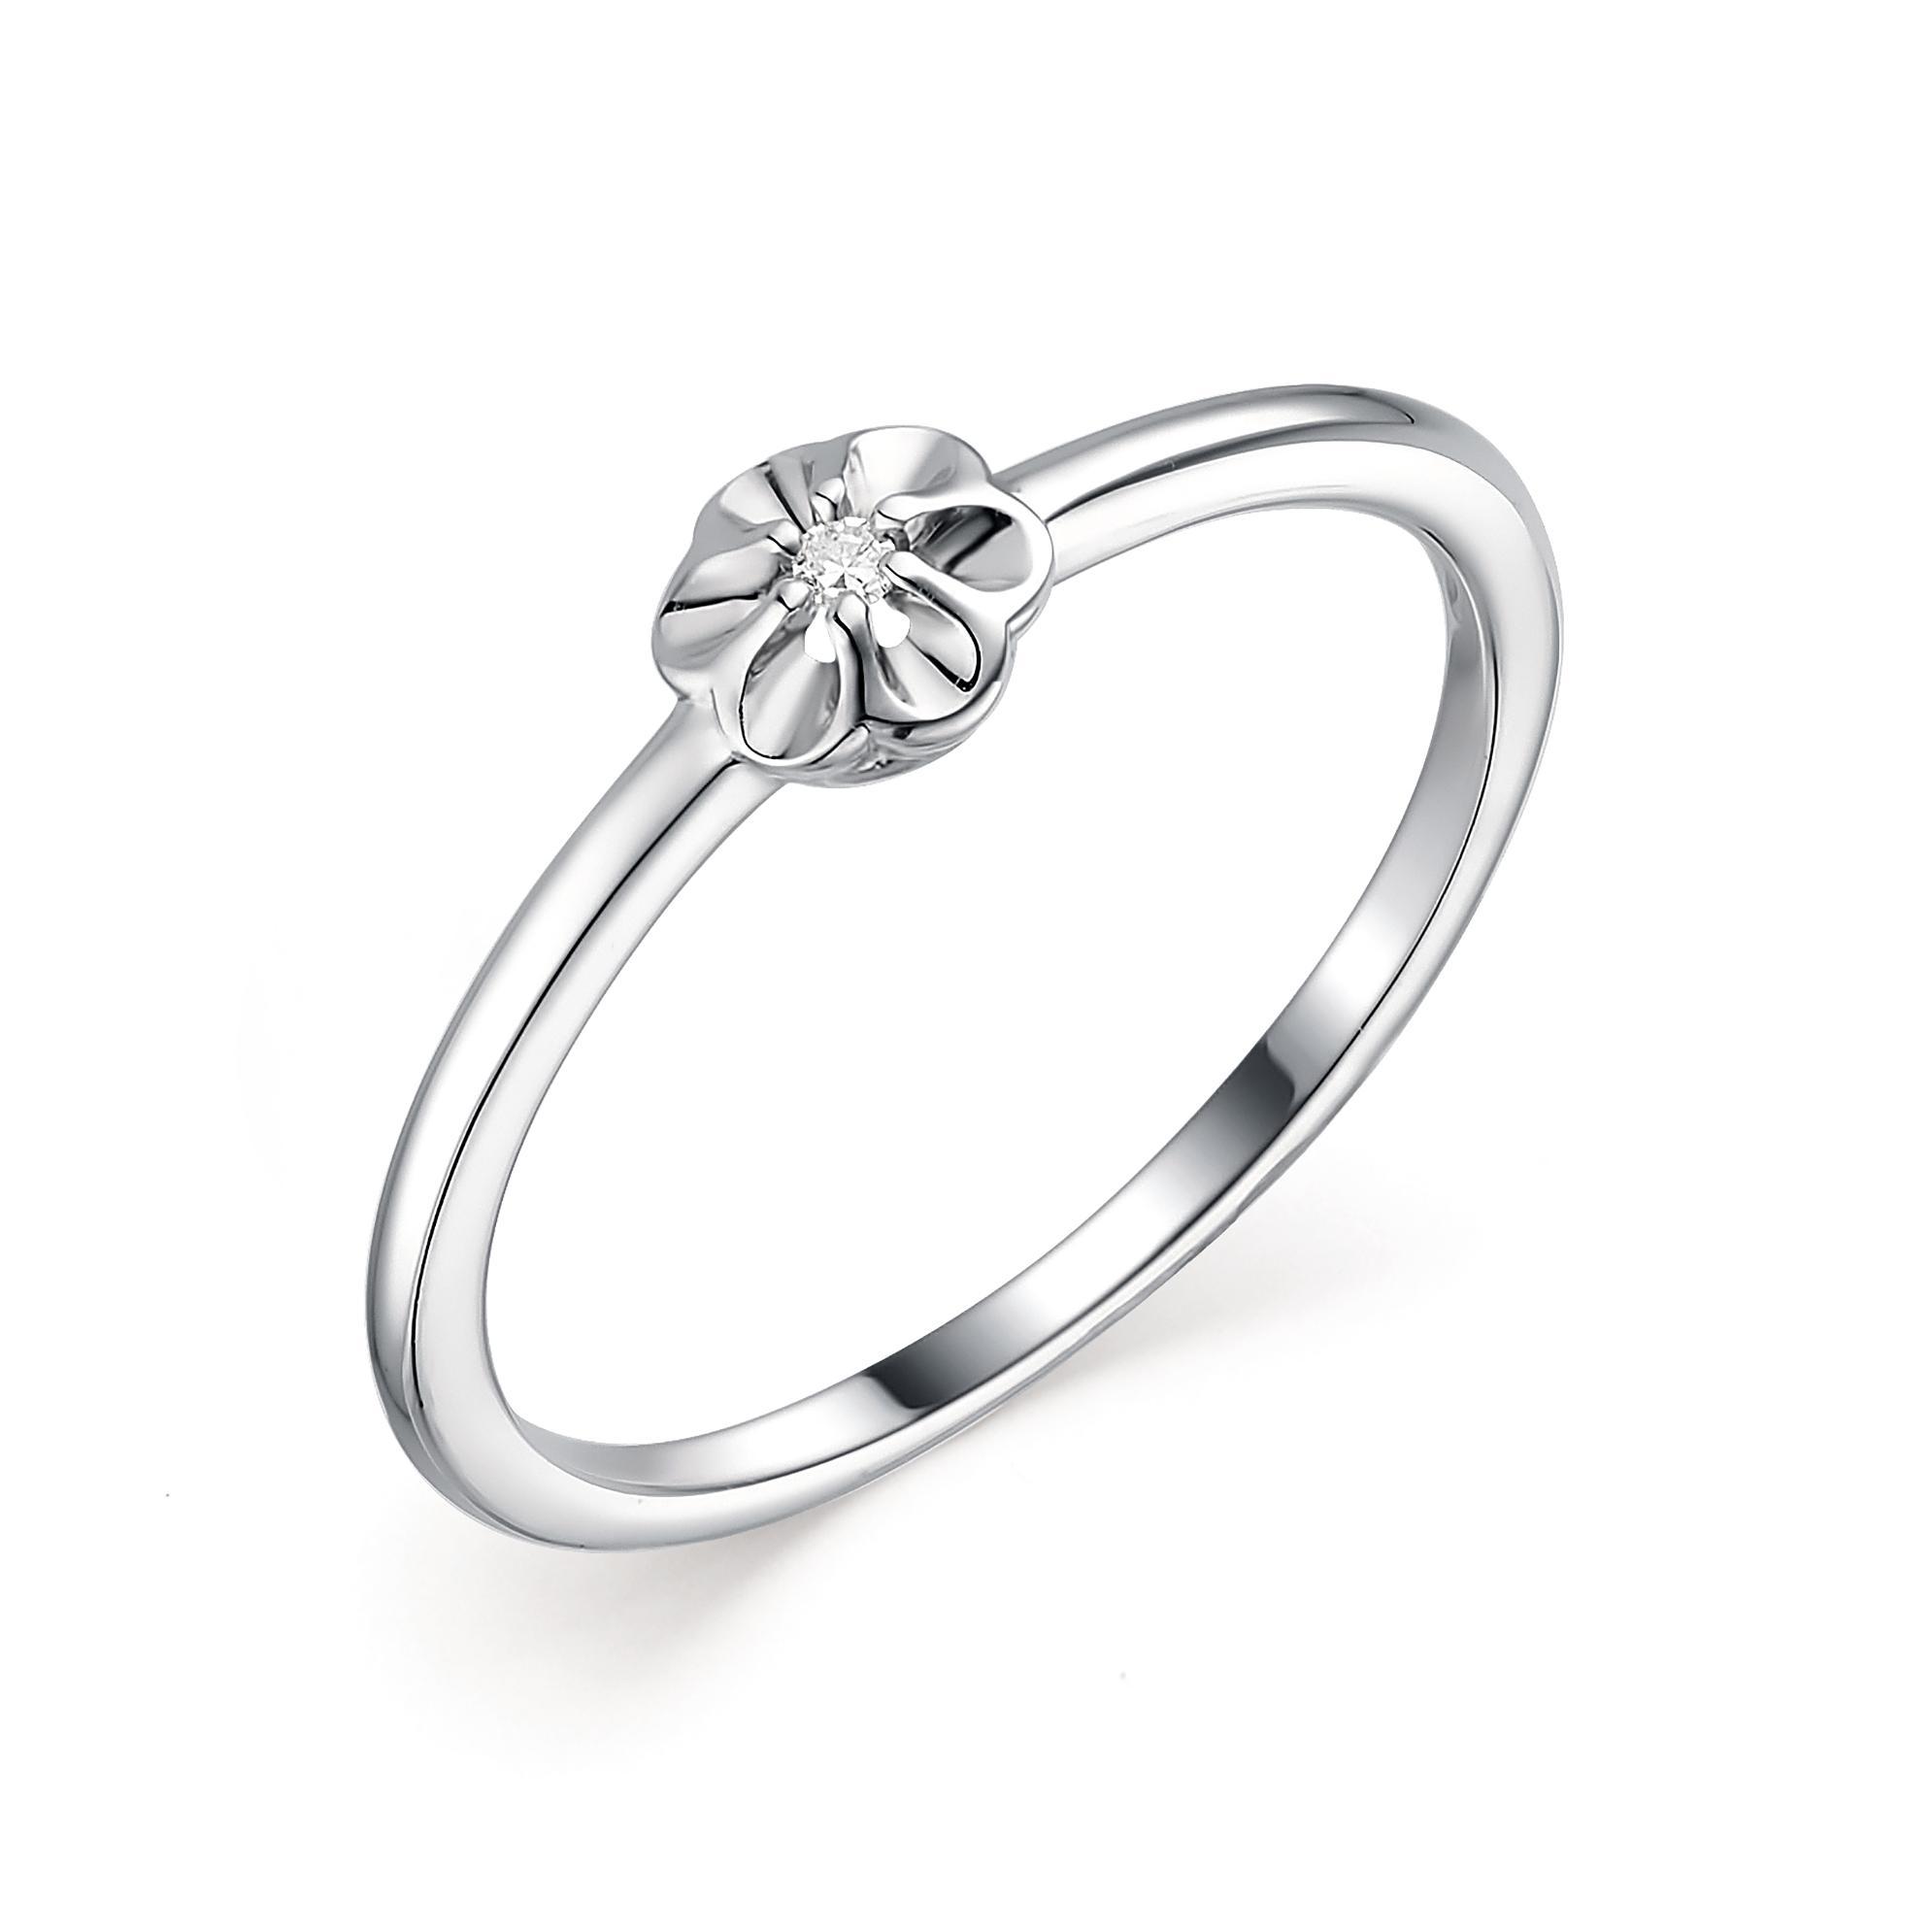 Серебряное кольцо Алькор с бриллиантом 01-1843/000Б-00